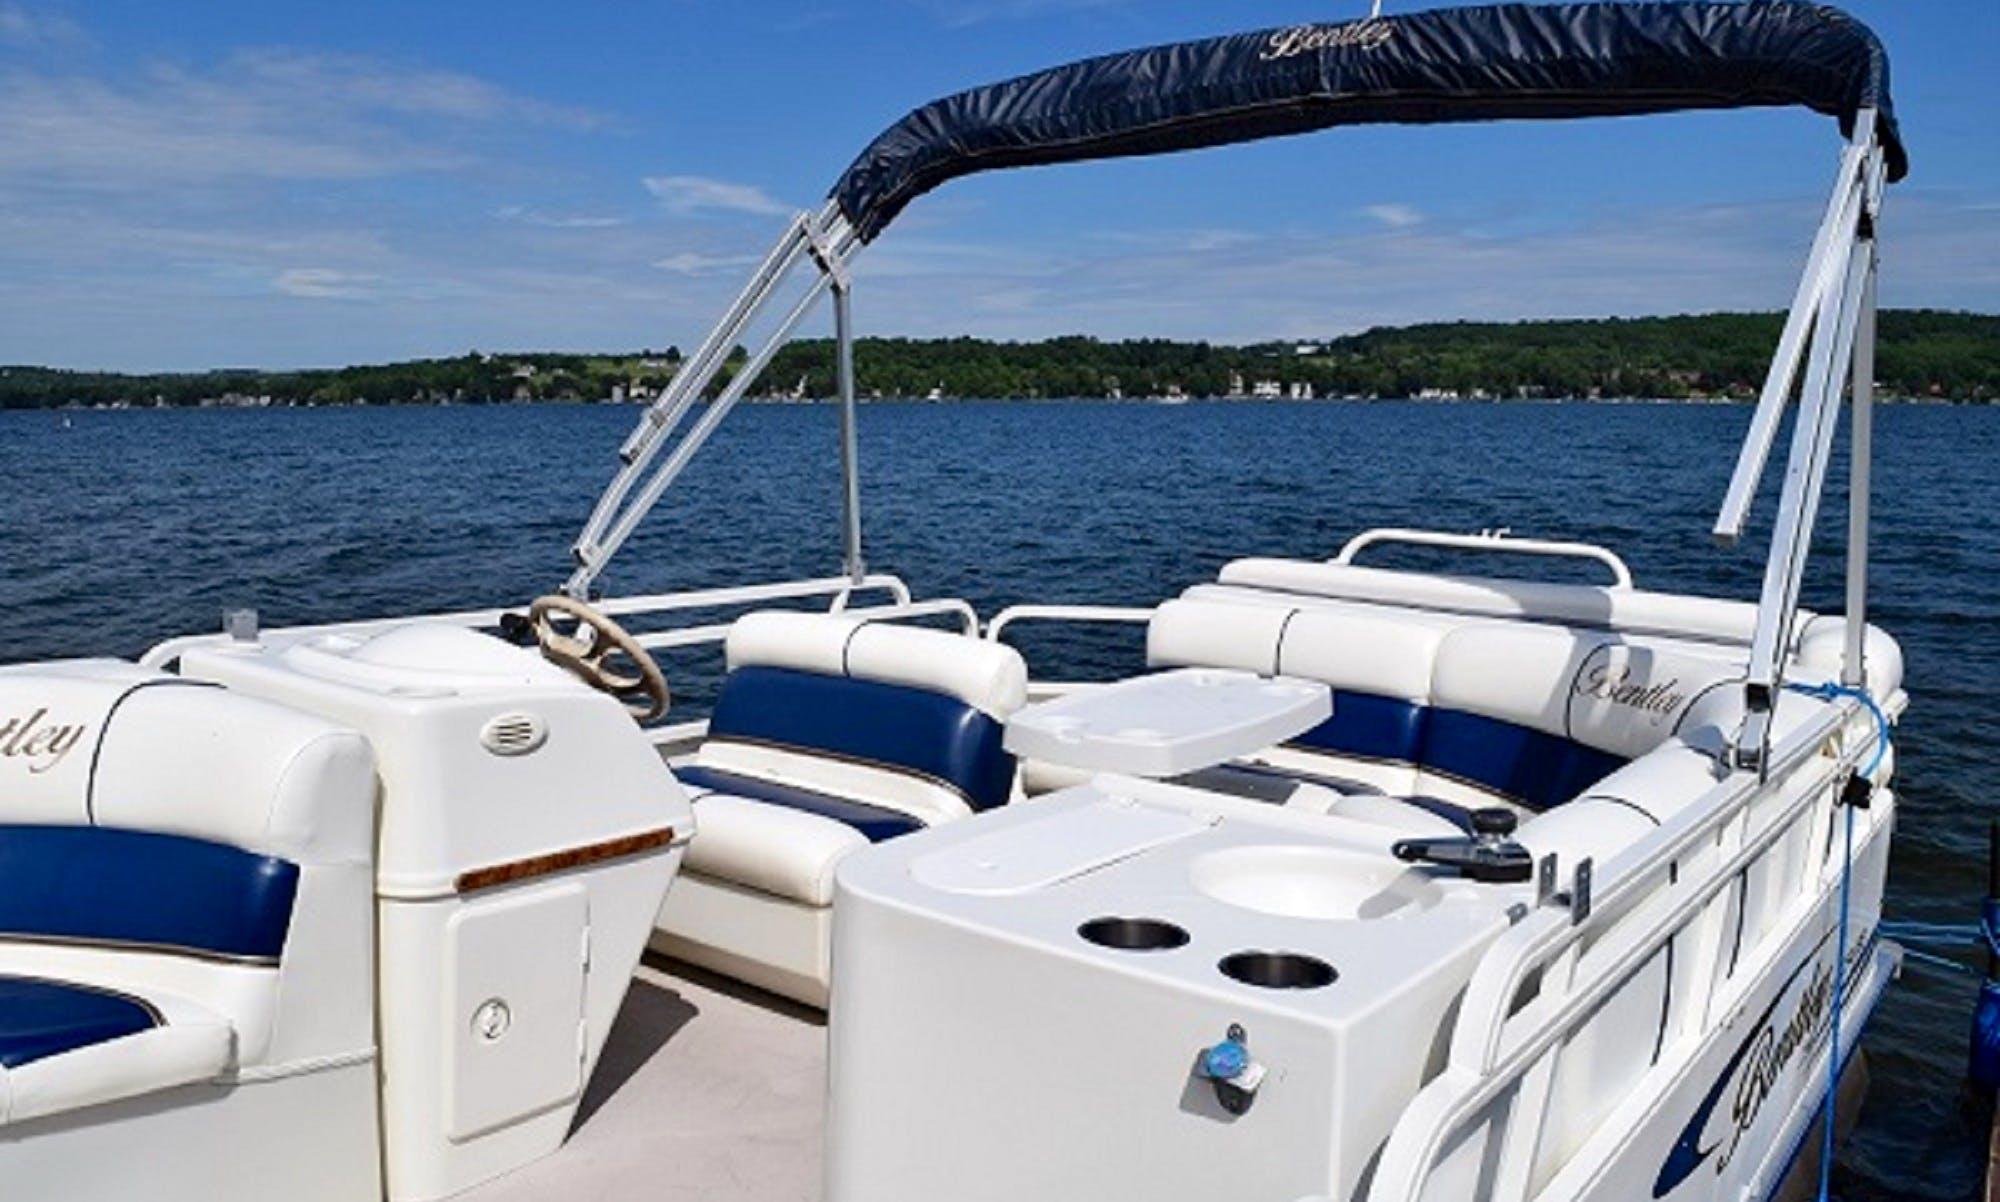 24' Bentley Pontoon Boat on beautiful Conesus Lake, NY